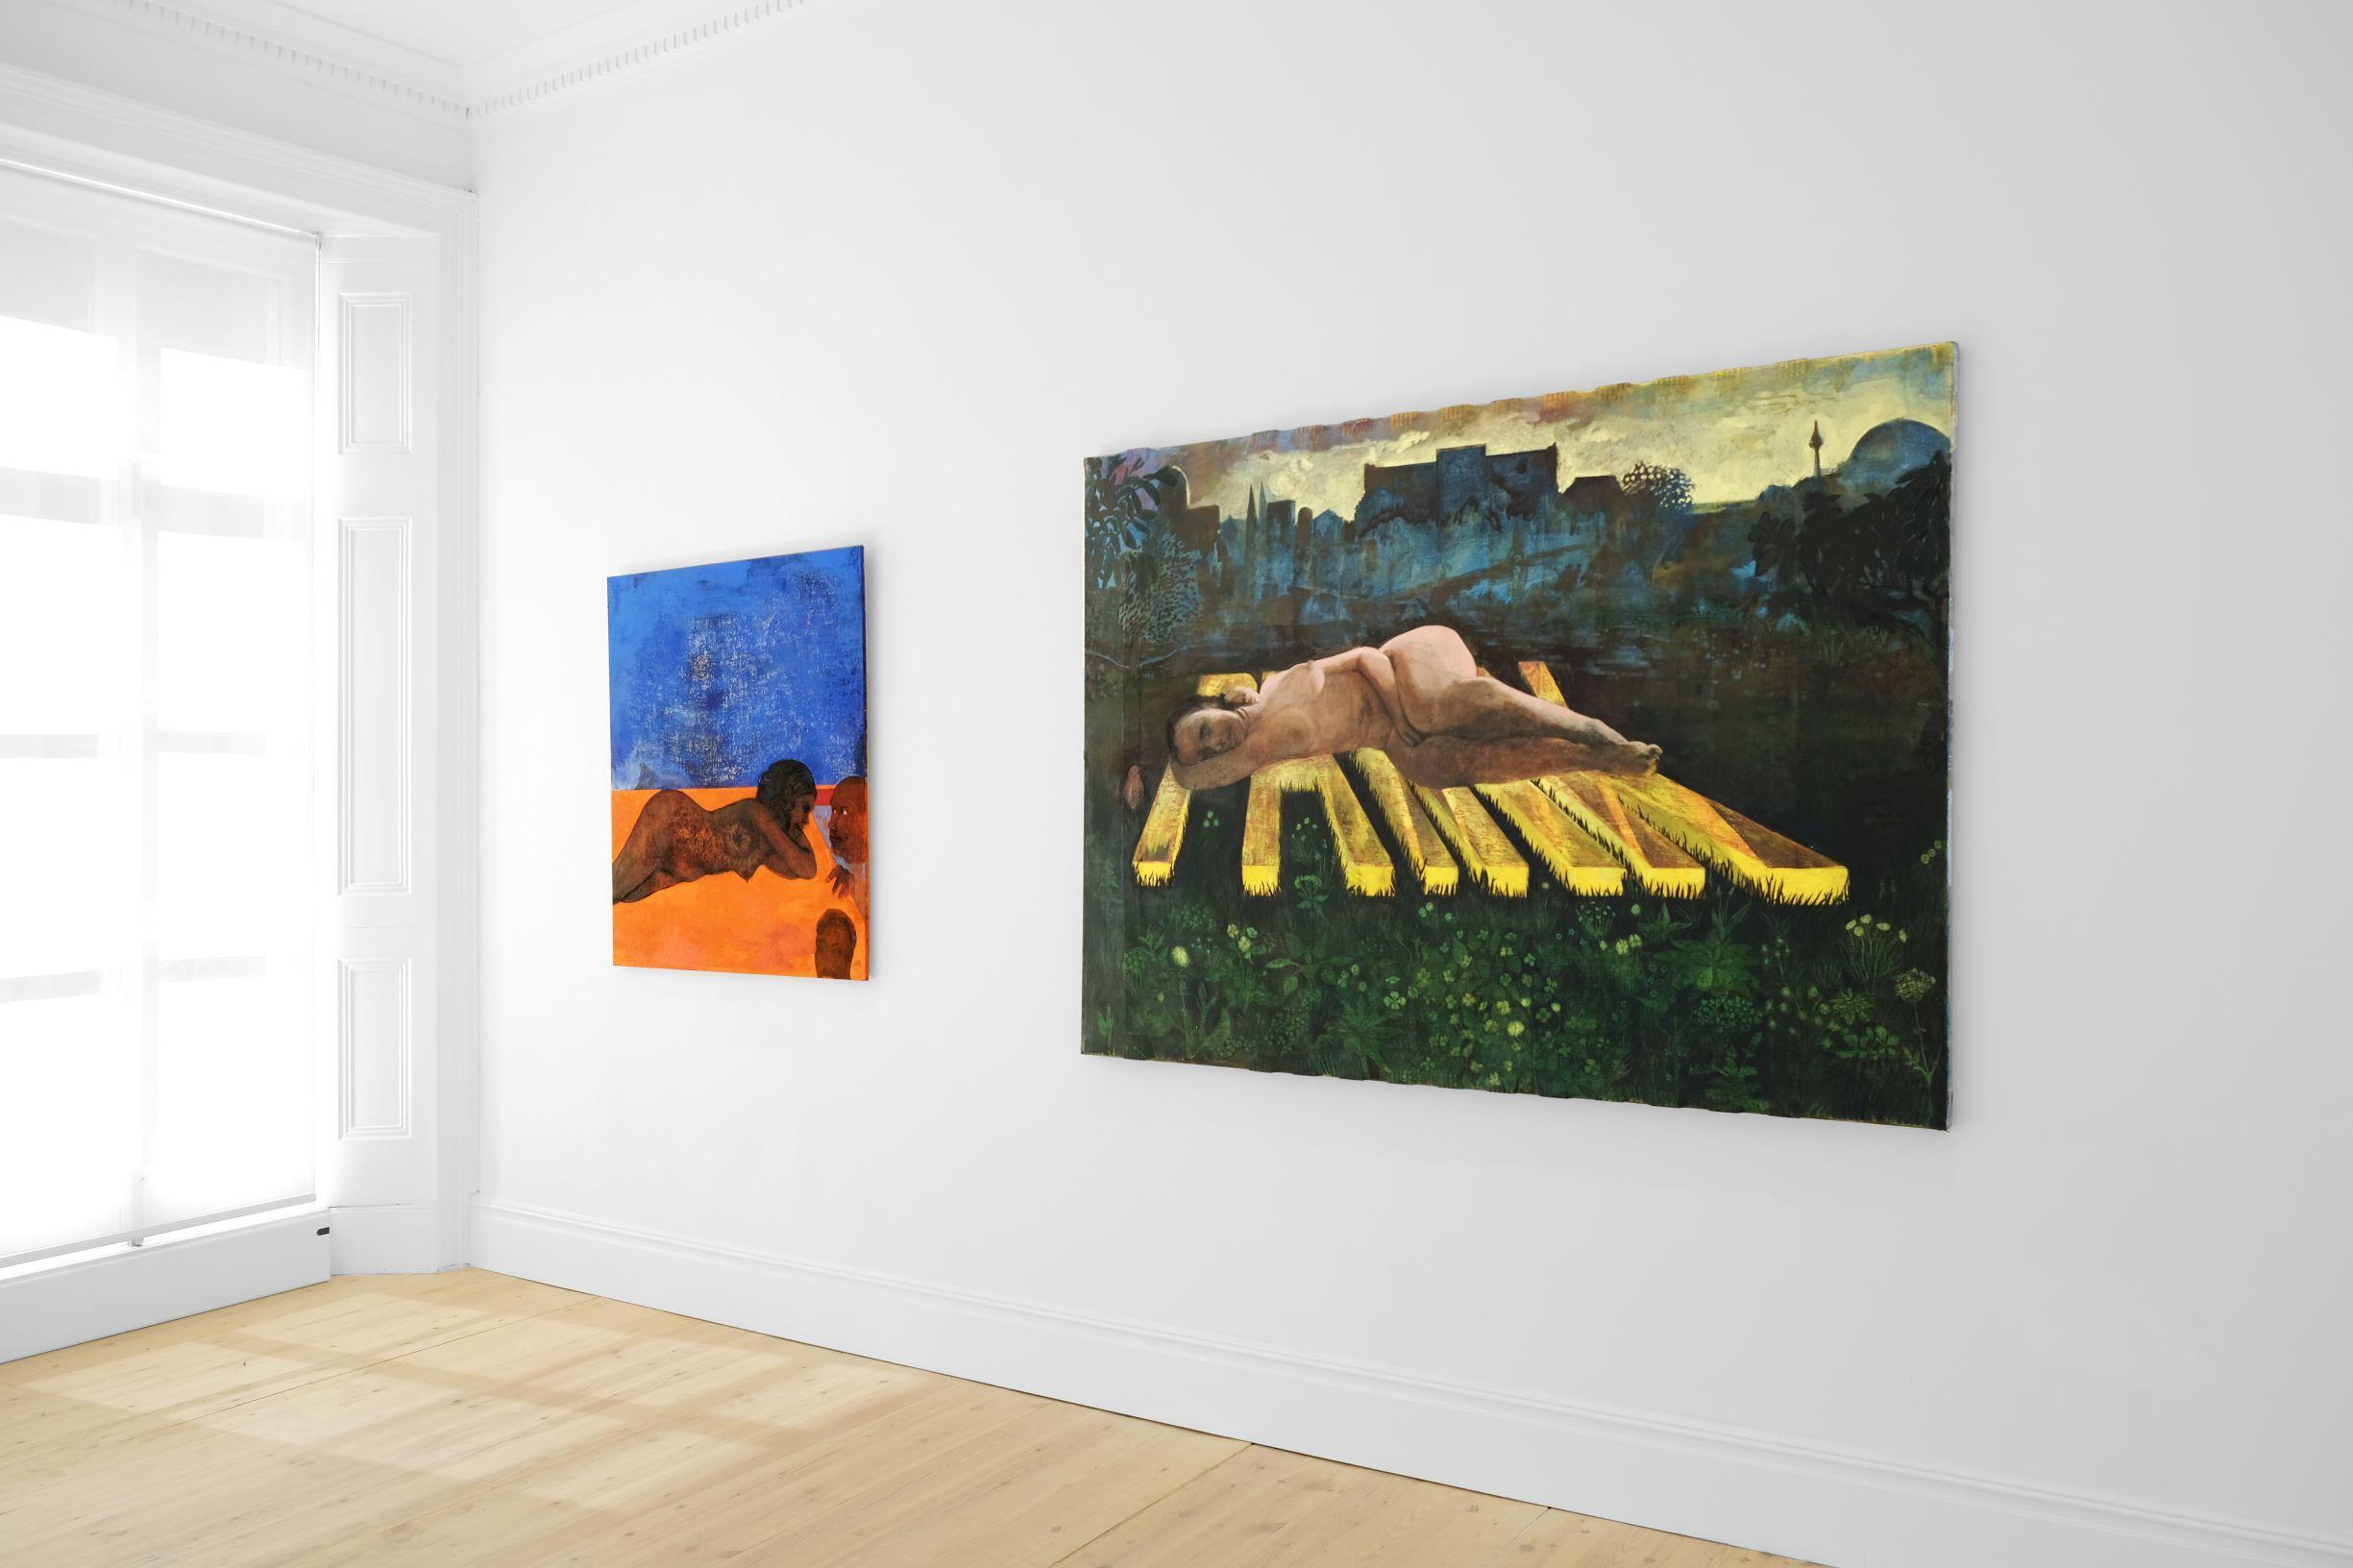 Stanislava Kovalcikova, Cautionary Tales, Installation 4, courtesy of MAMOTH, 2020